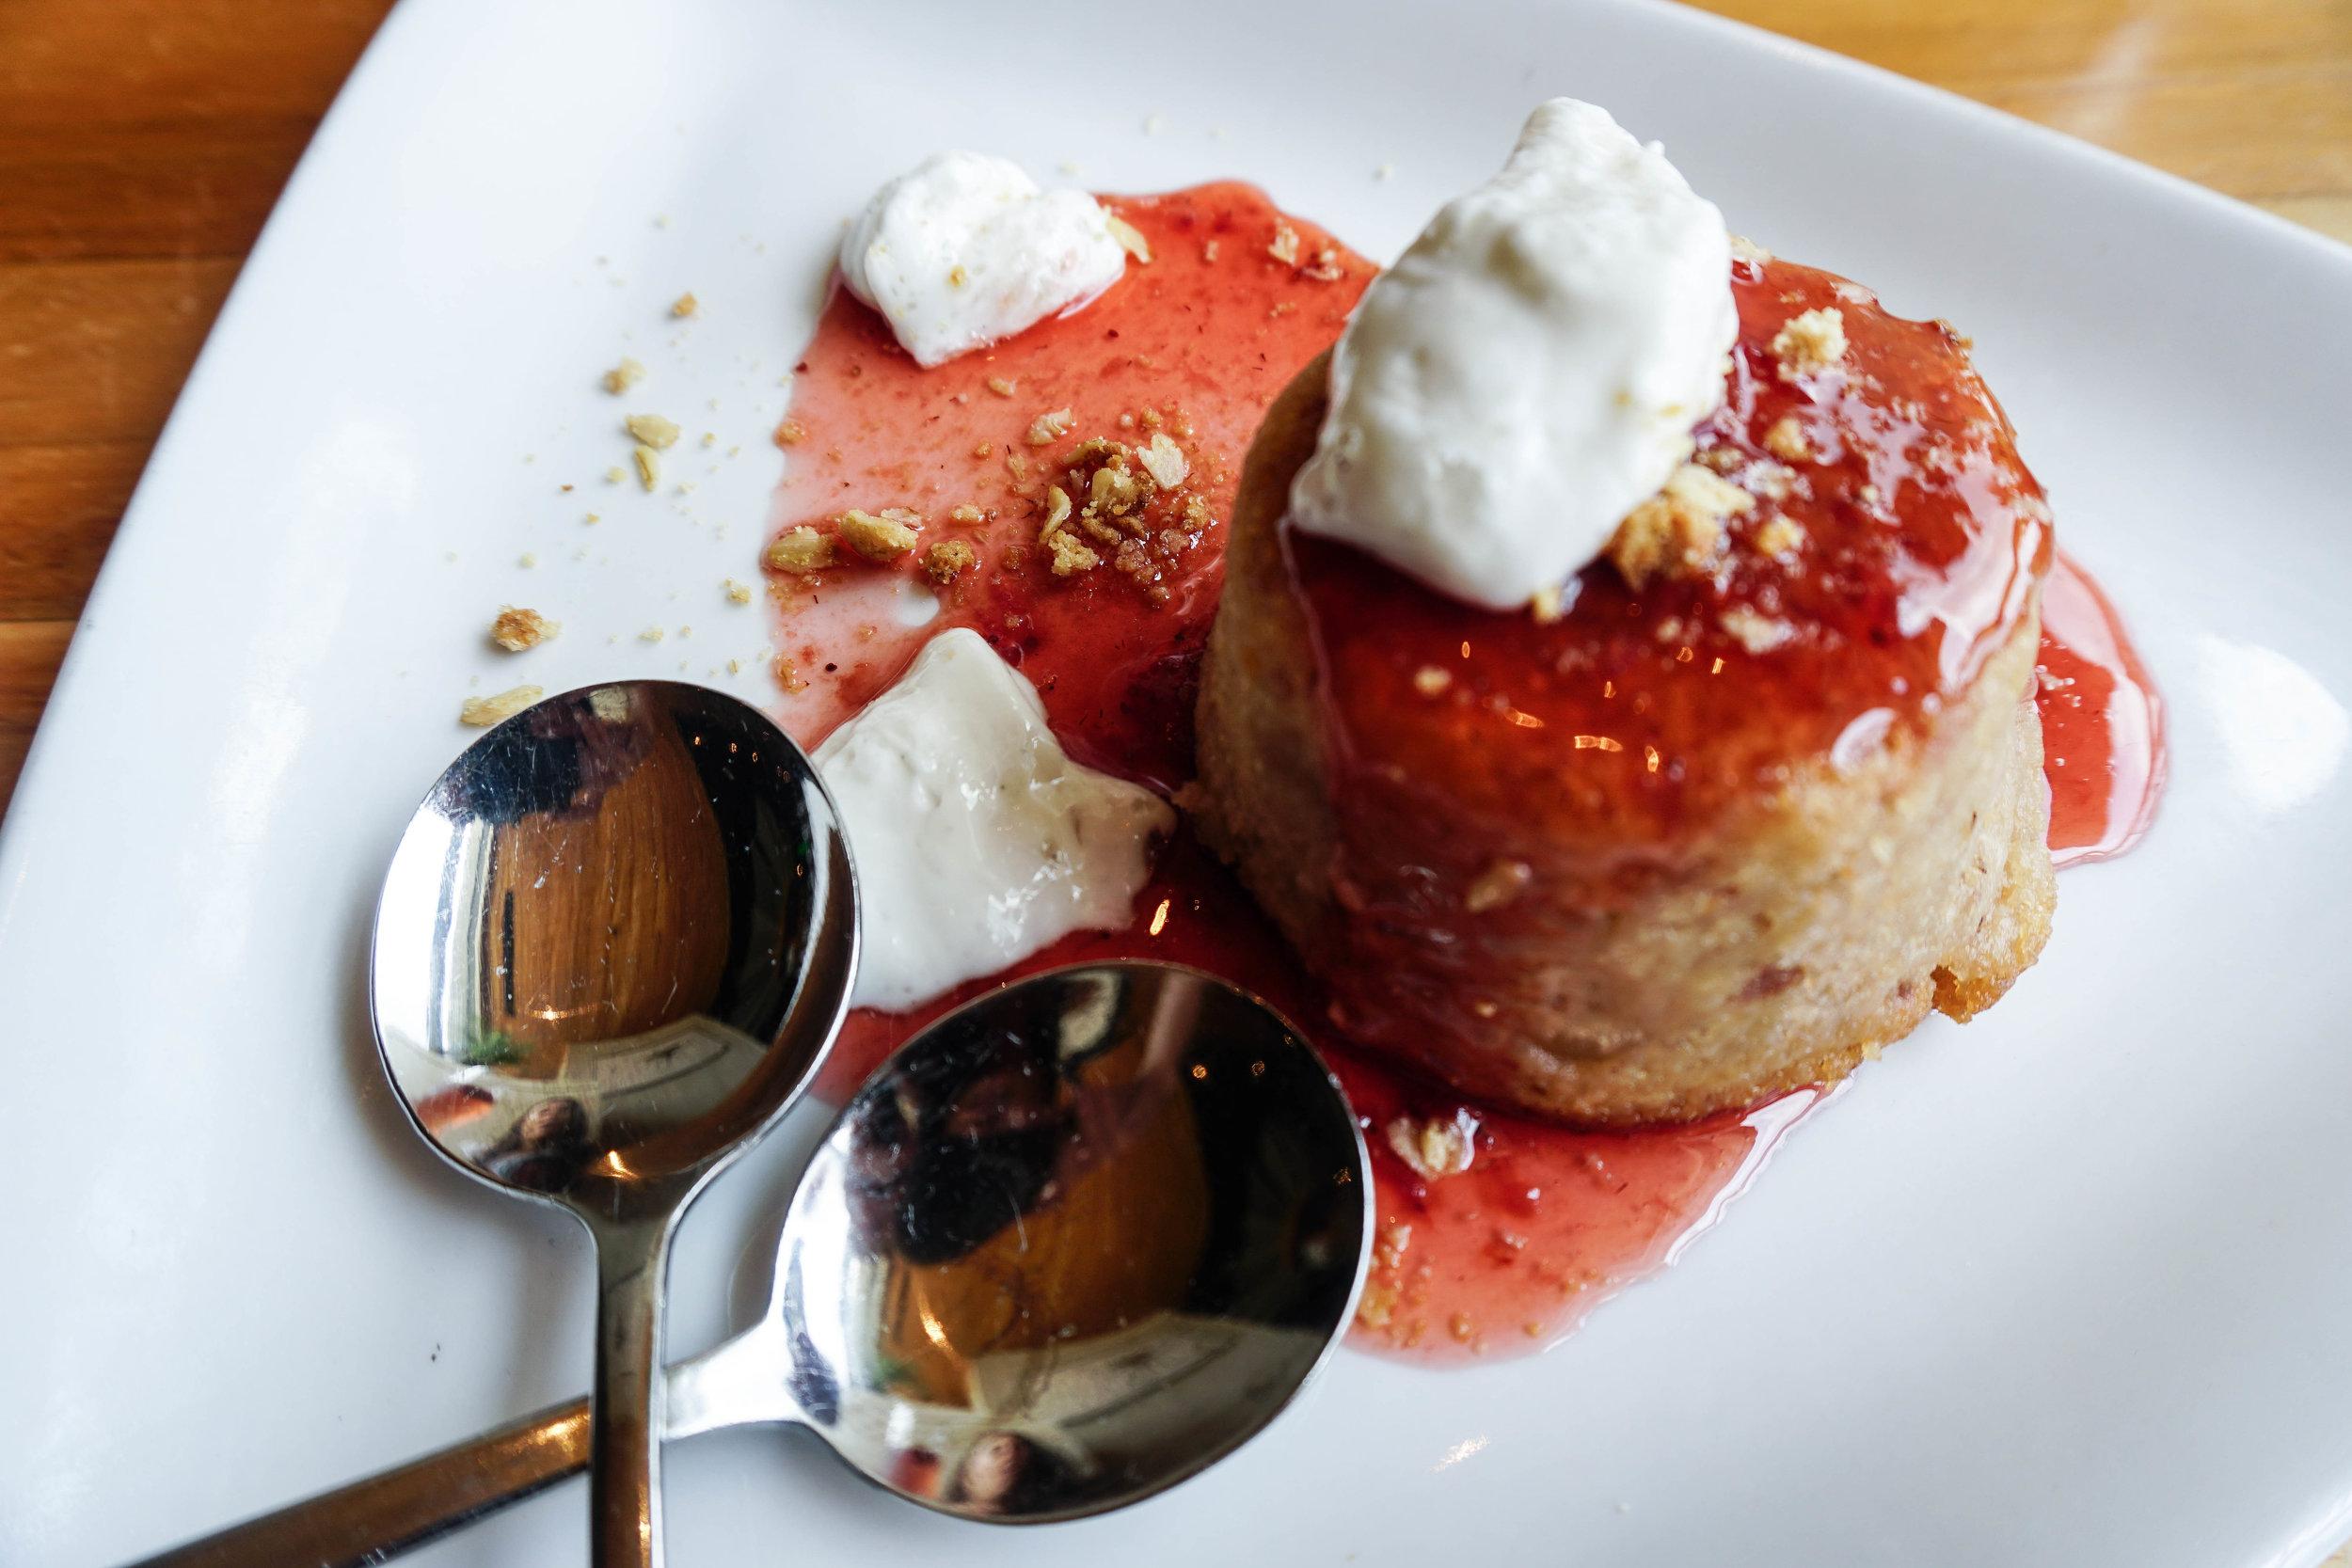 Strawberry Rhubarb Upside Down Cake (gf, df)